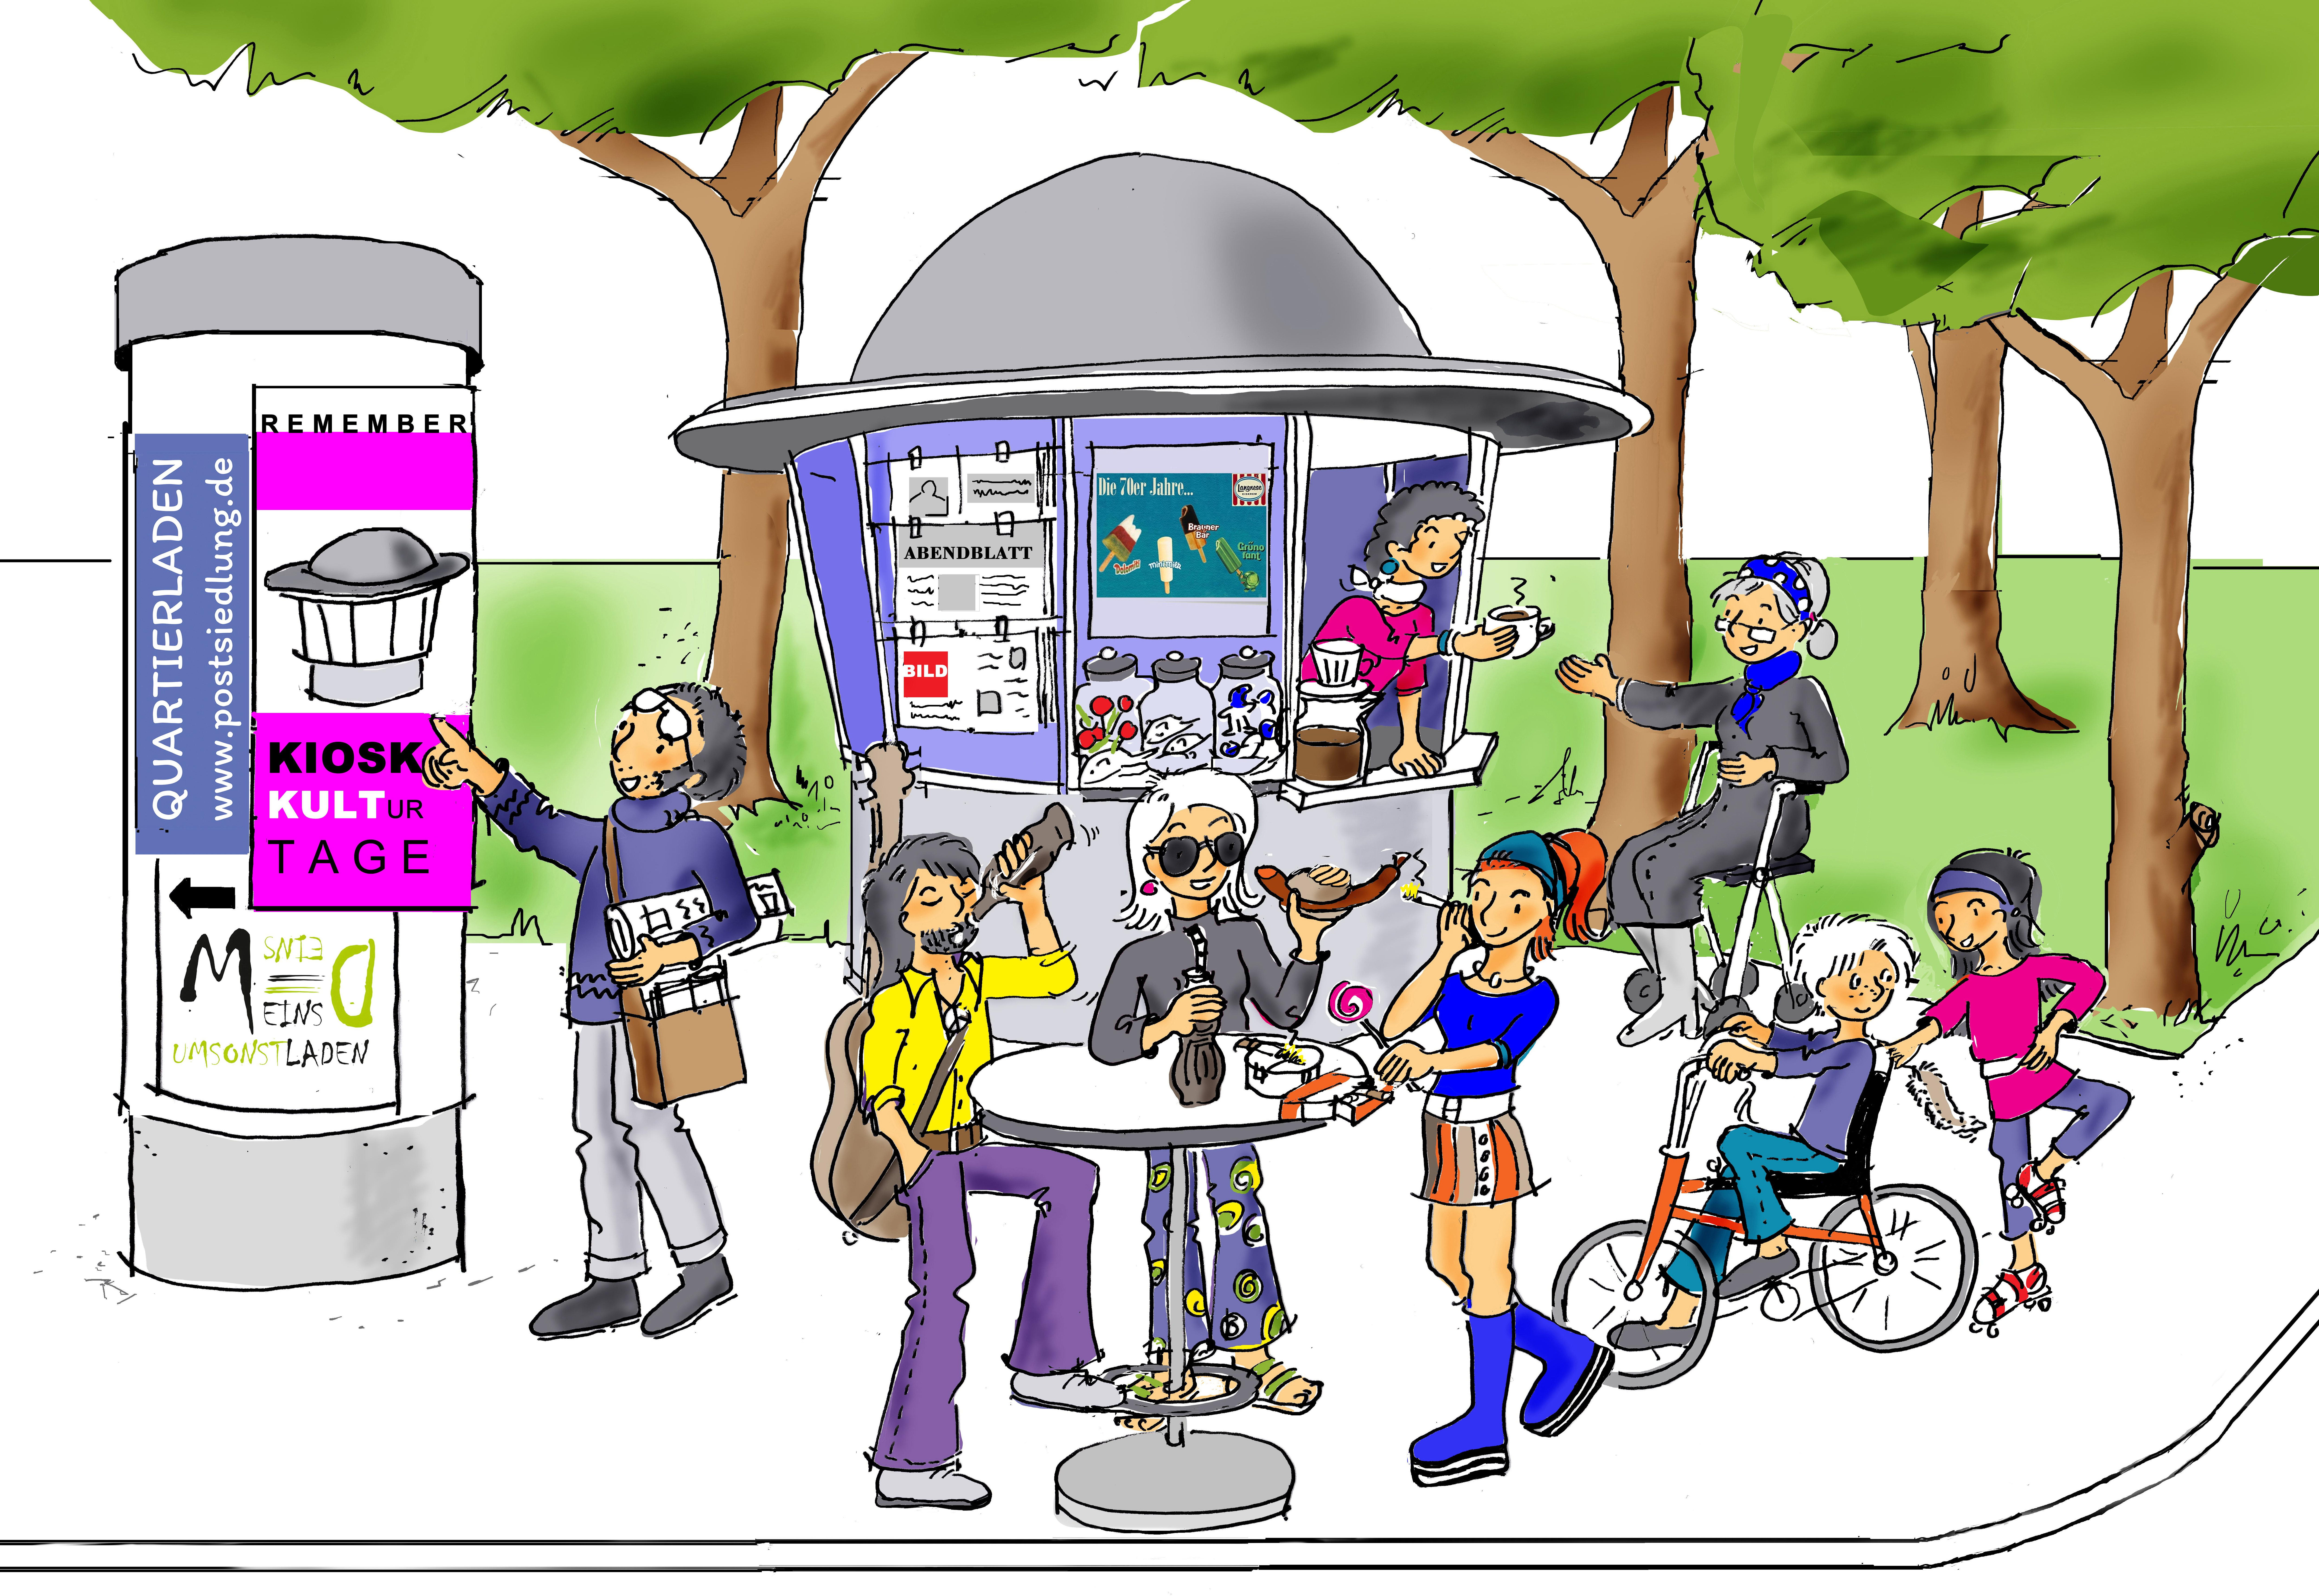 Nostalgie-Kiosk anno 1975 – Nachbarschaft leben. Kiosk KULTur erleben. Solidarität stiften.